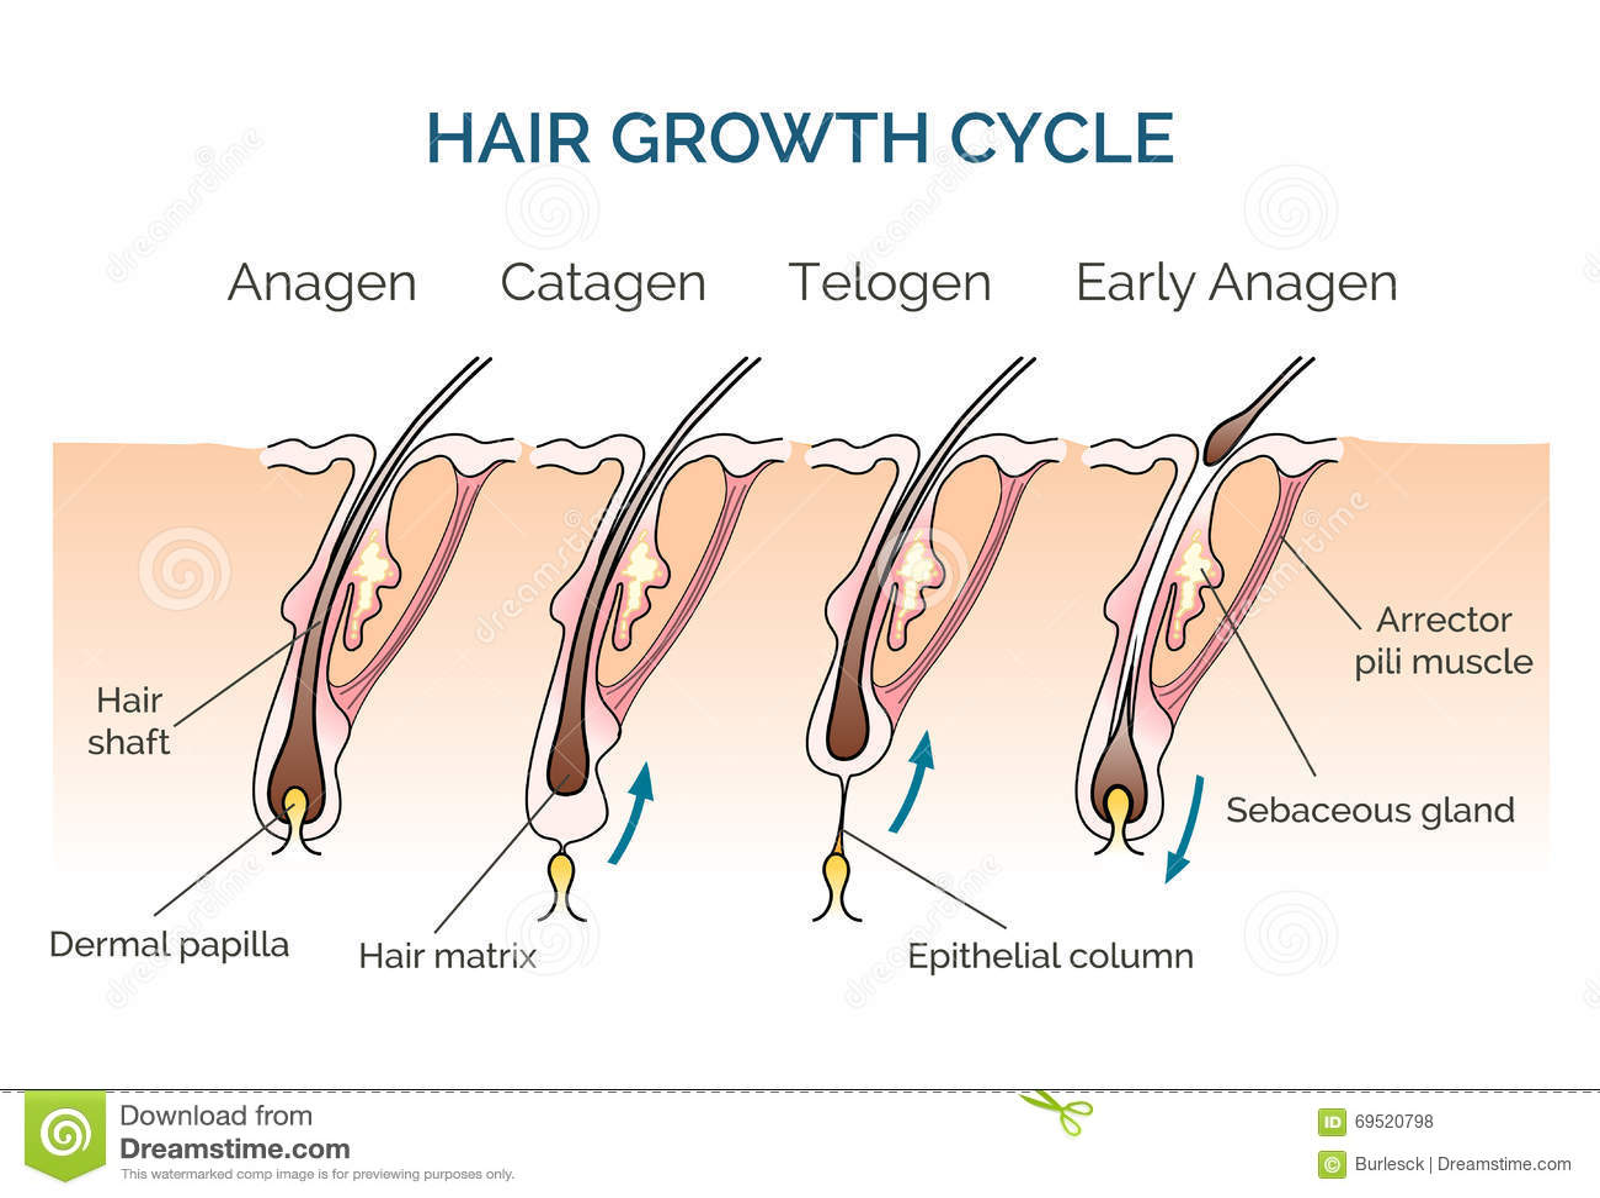 Hair growth cycle hair cycle science phase hair human hair growth